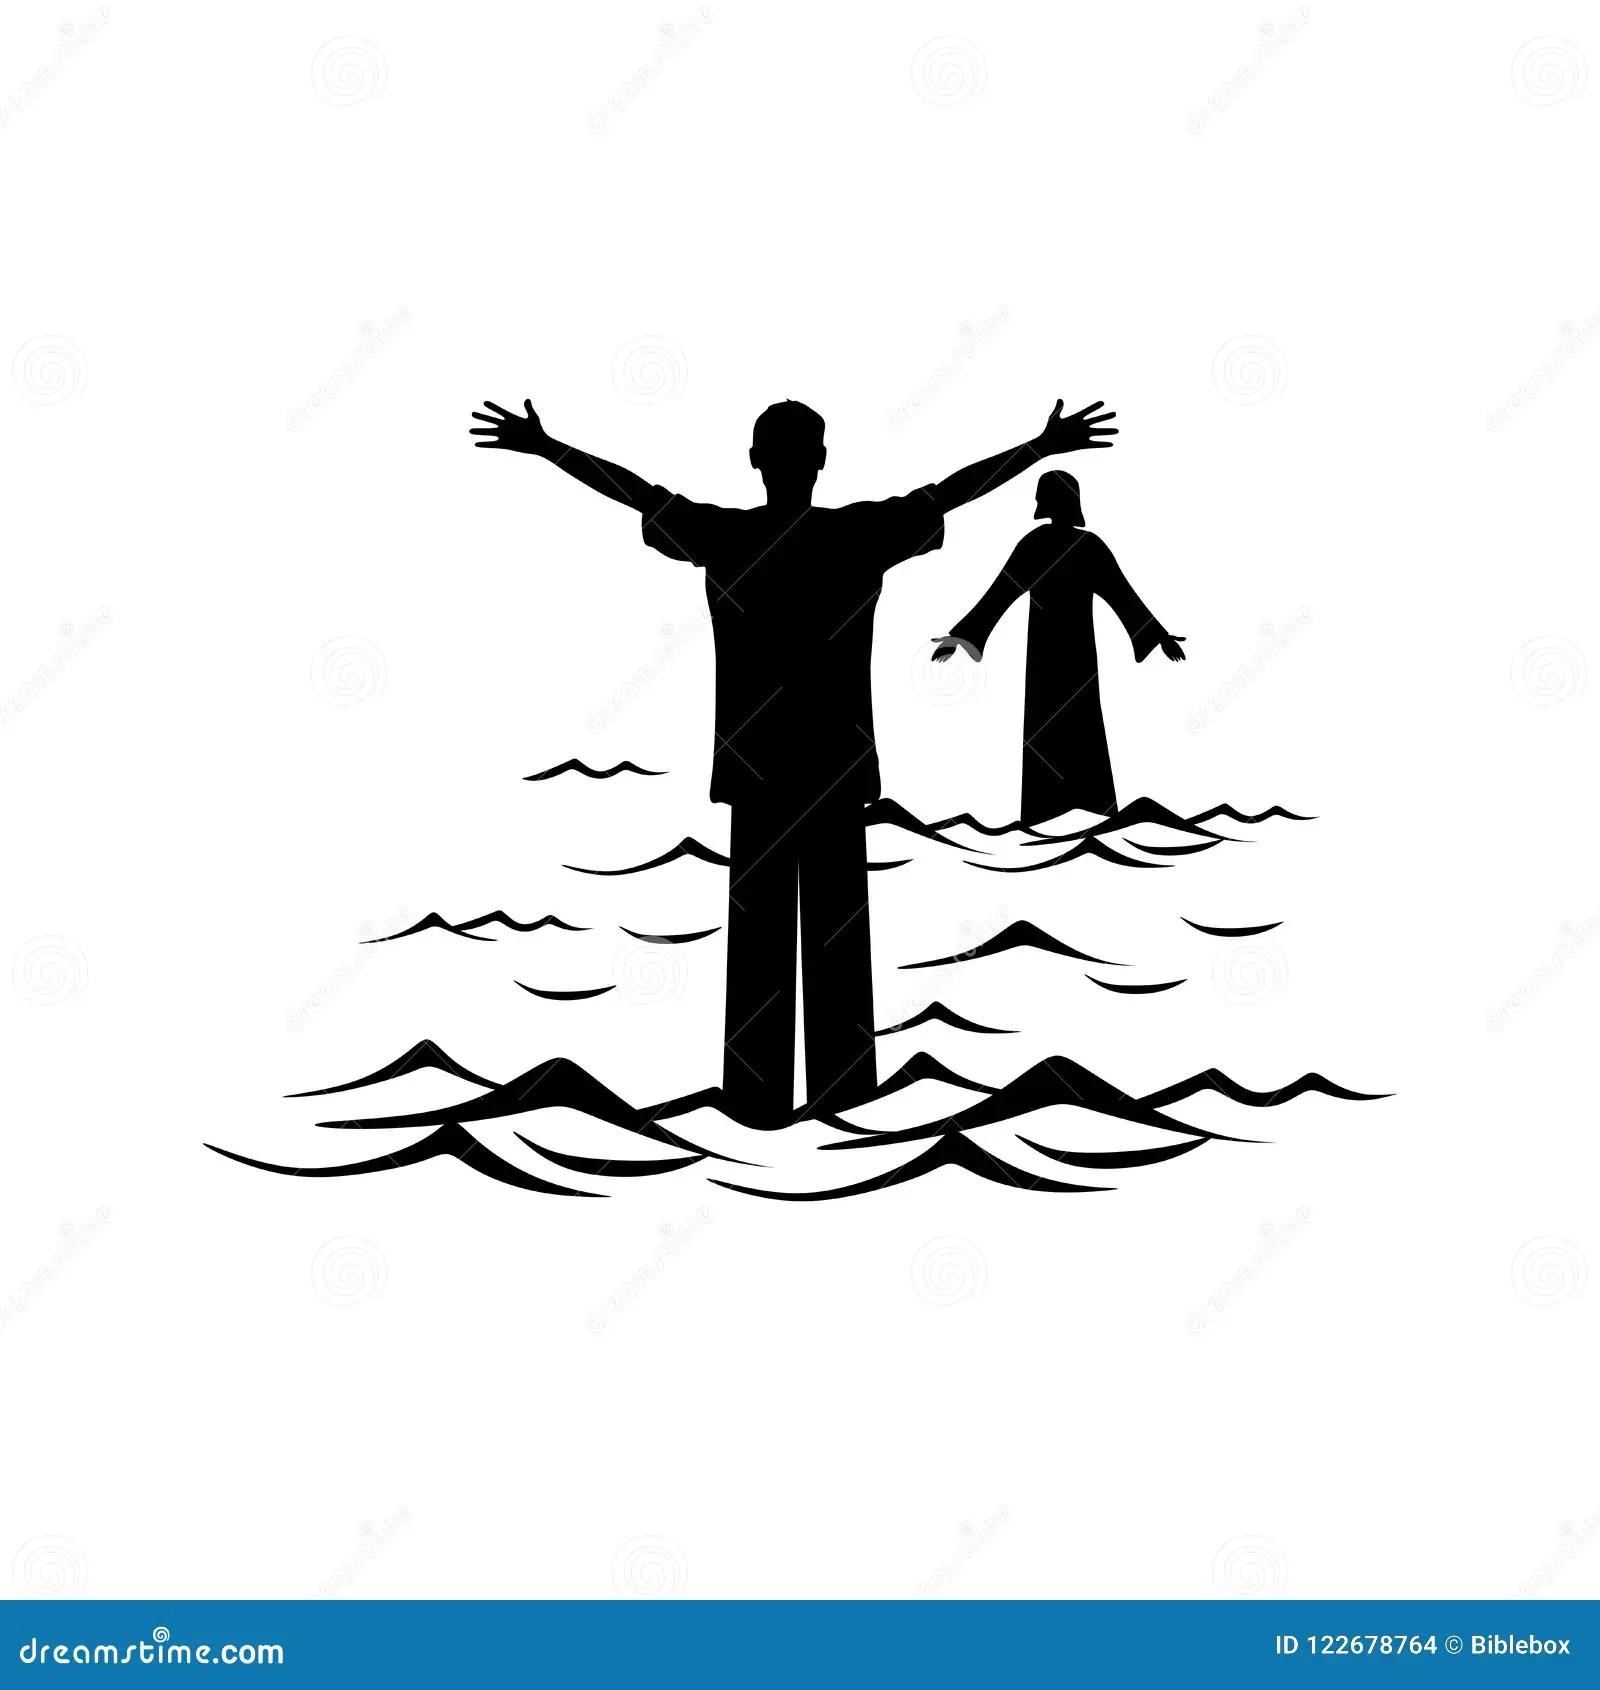 Christian Illustration A Man Walks The Water Towards